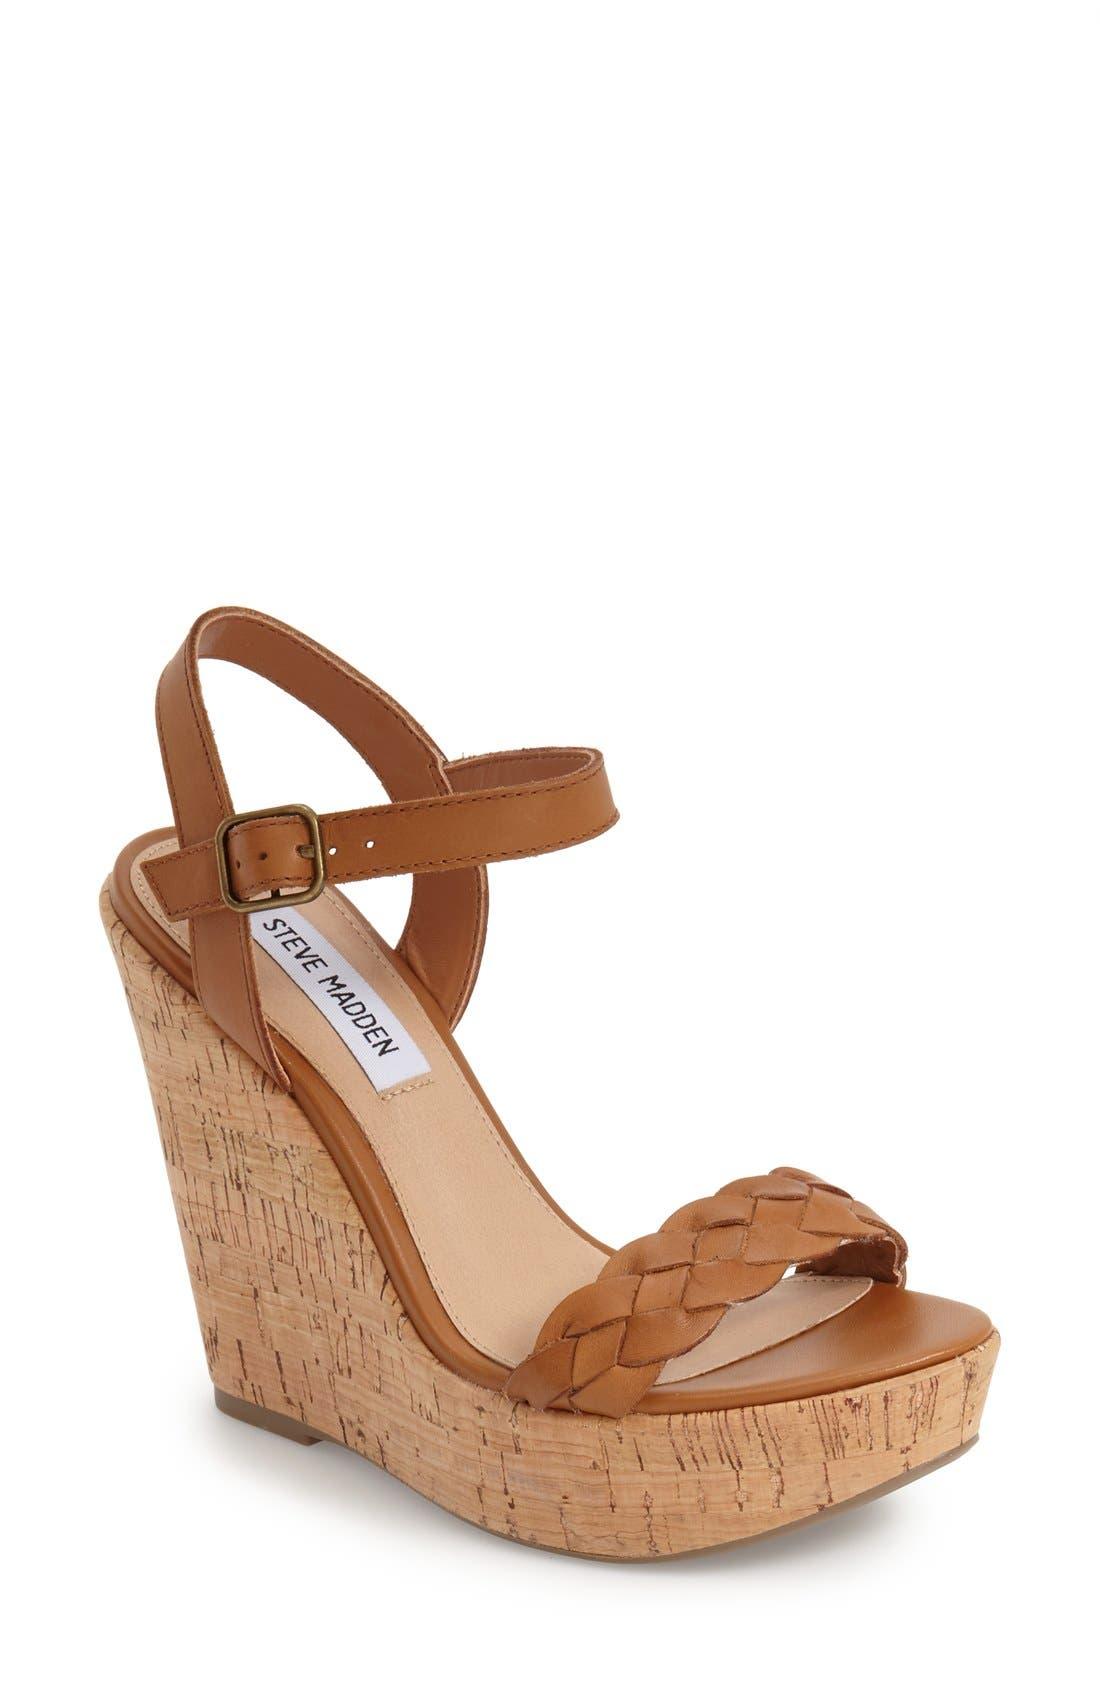 Alternate Image 1 Selected - Steve Madden 'Emmey' Platform Wedge Sandal (Women)